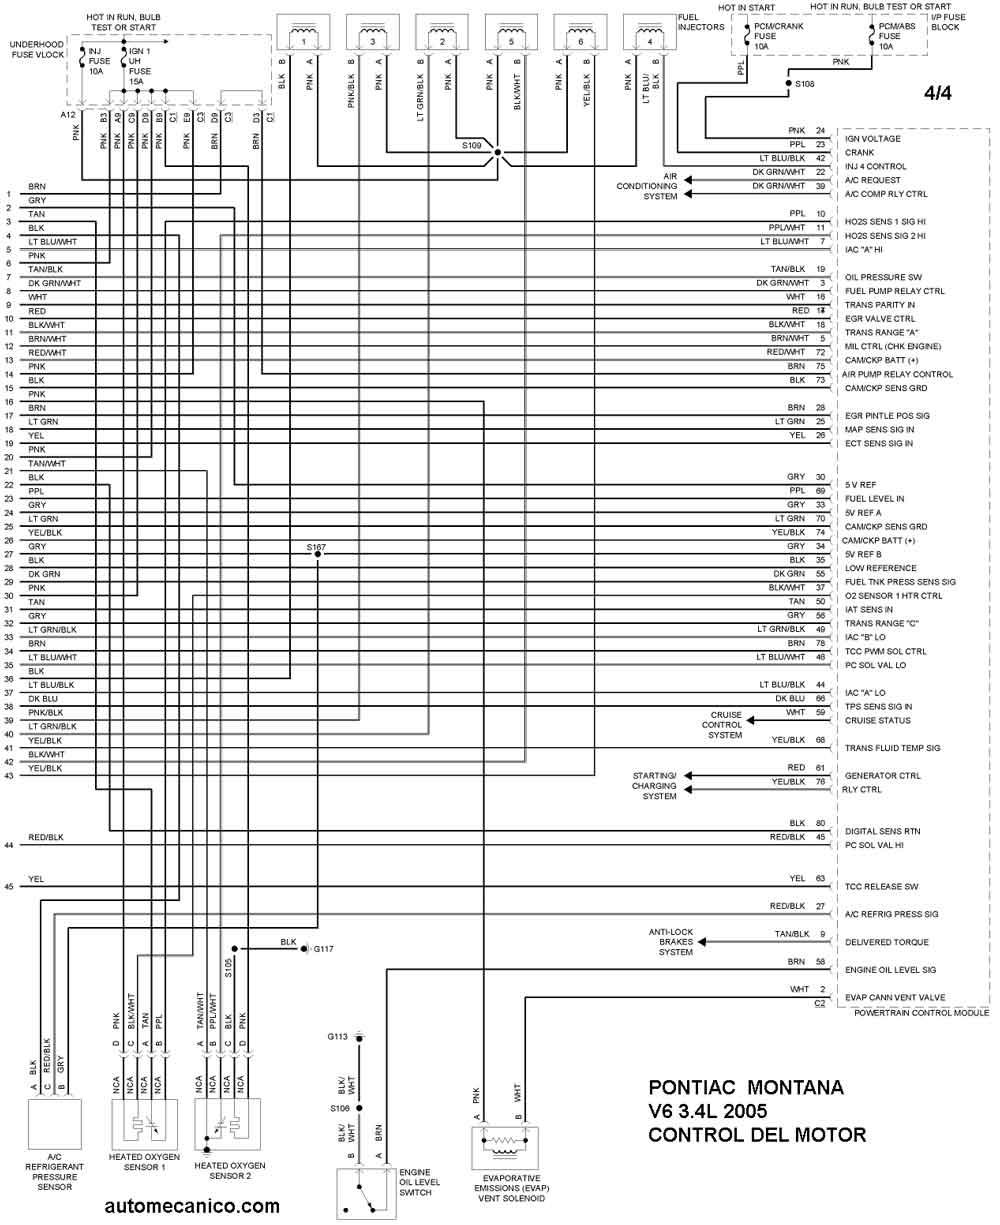 pontiac vibe Diagrama del motor